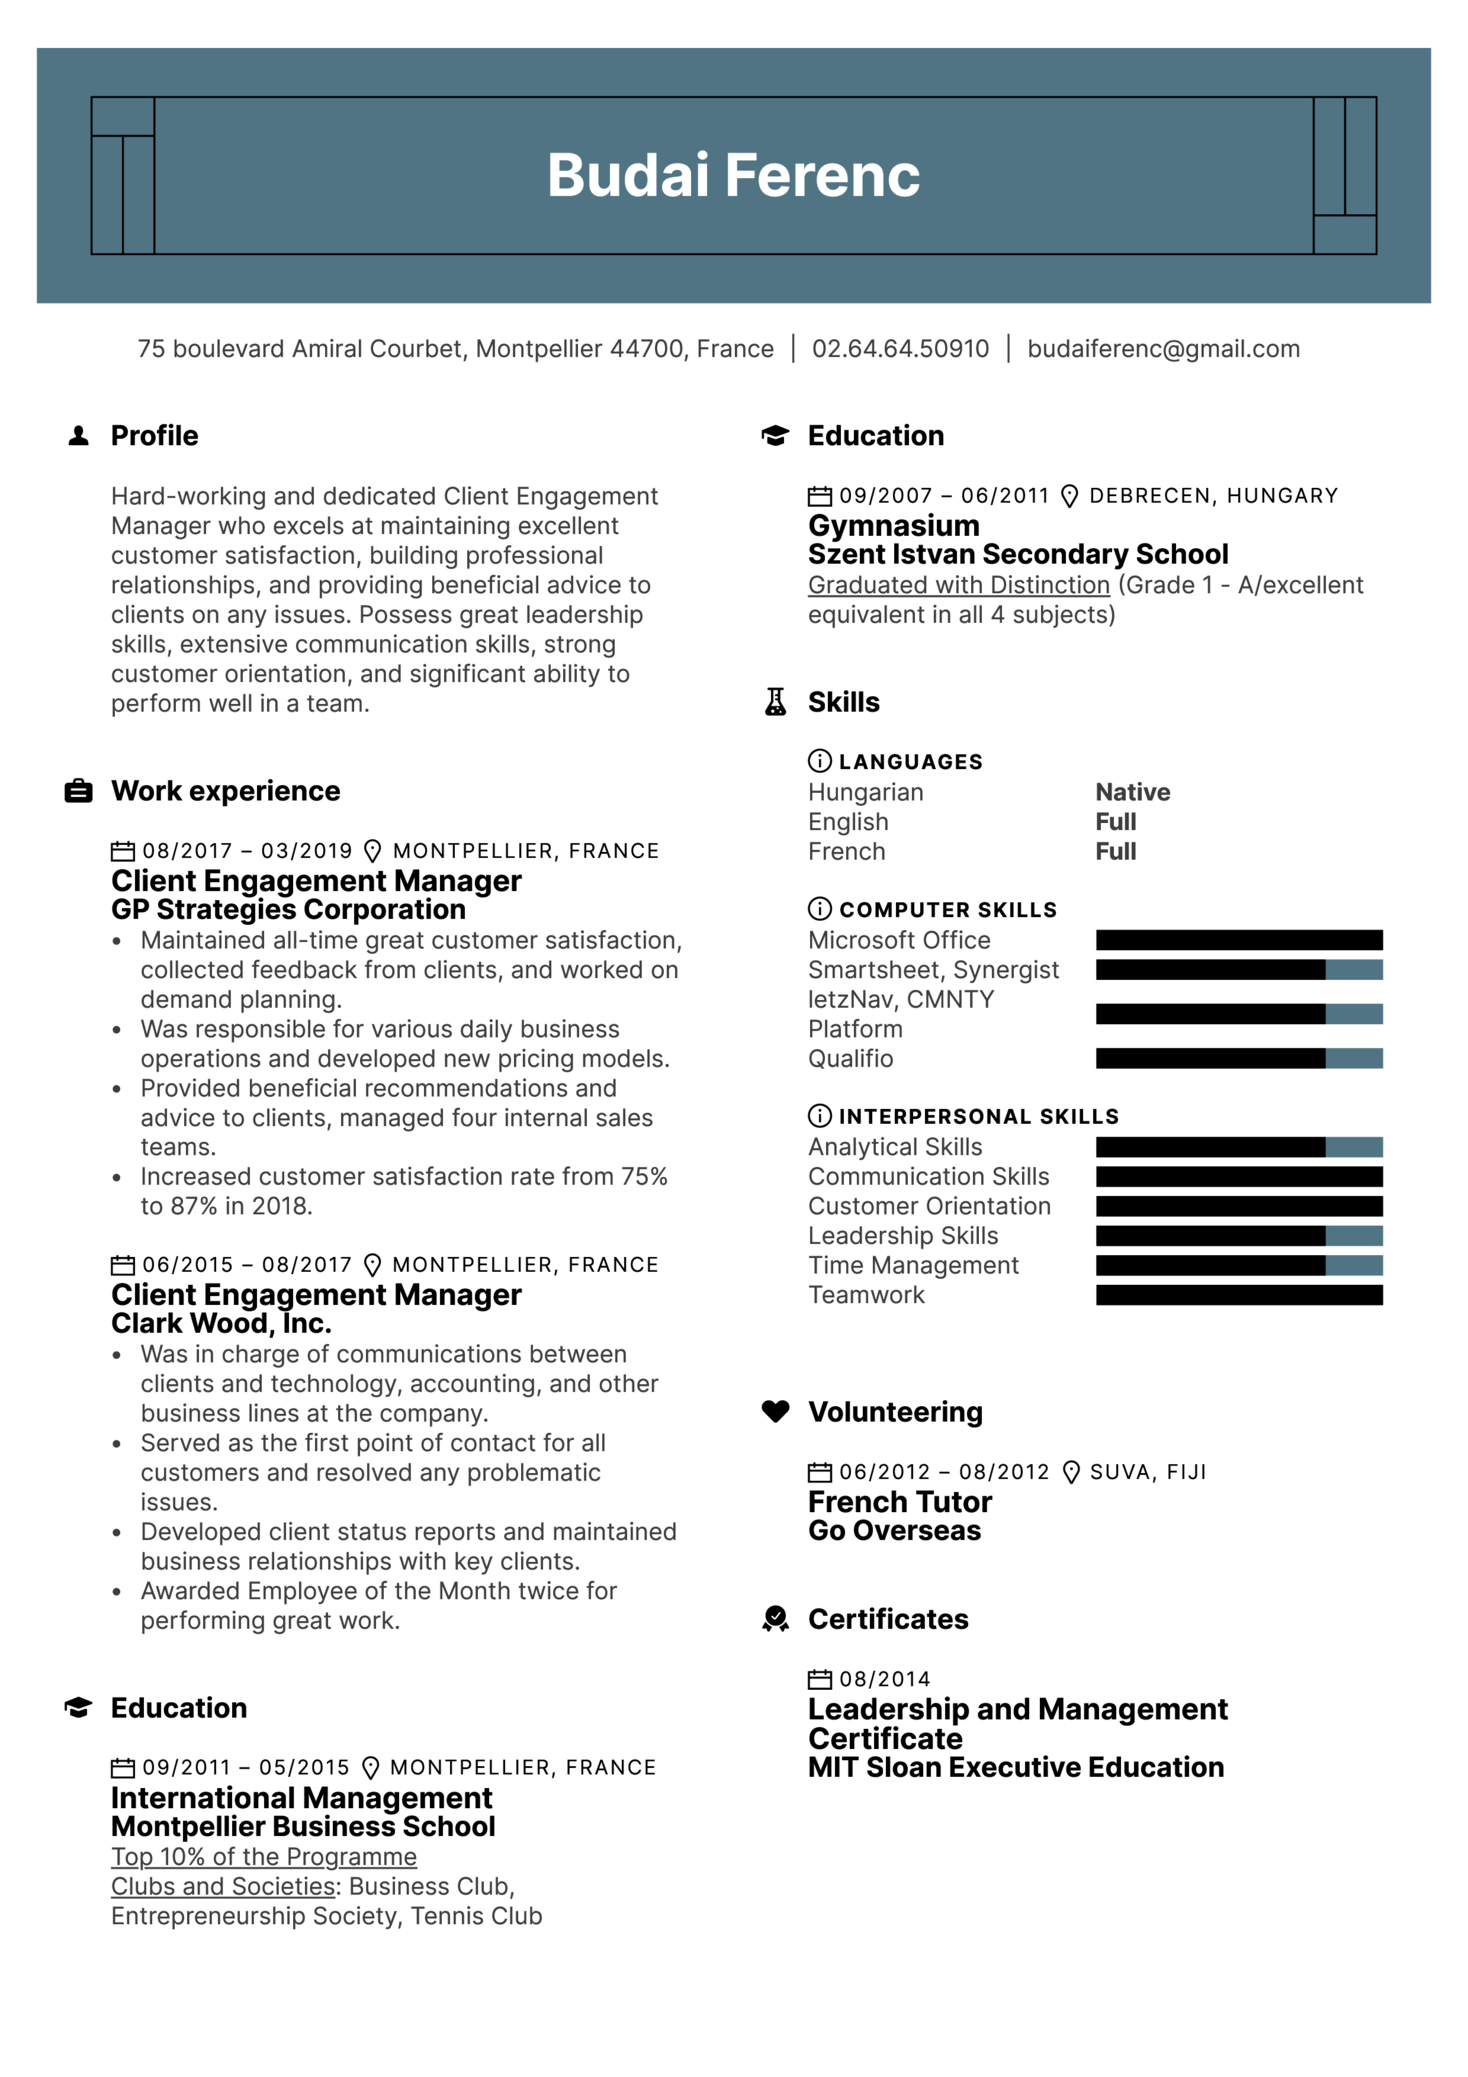 Client Engagement Manager Resume Sample (parte 1)